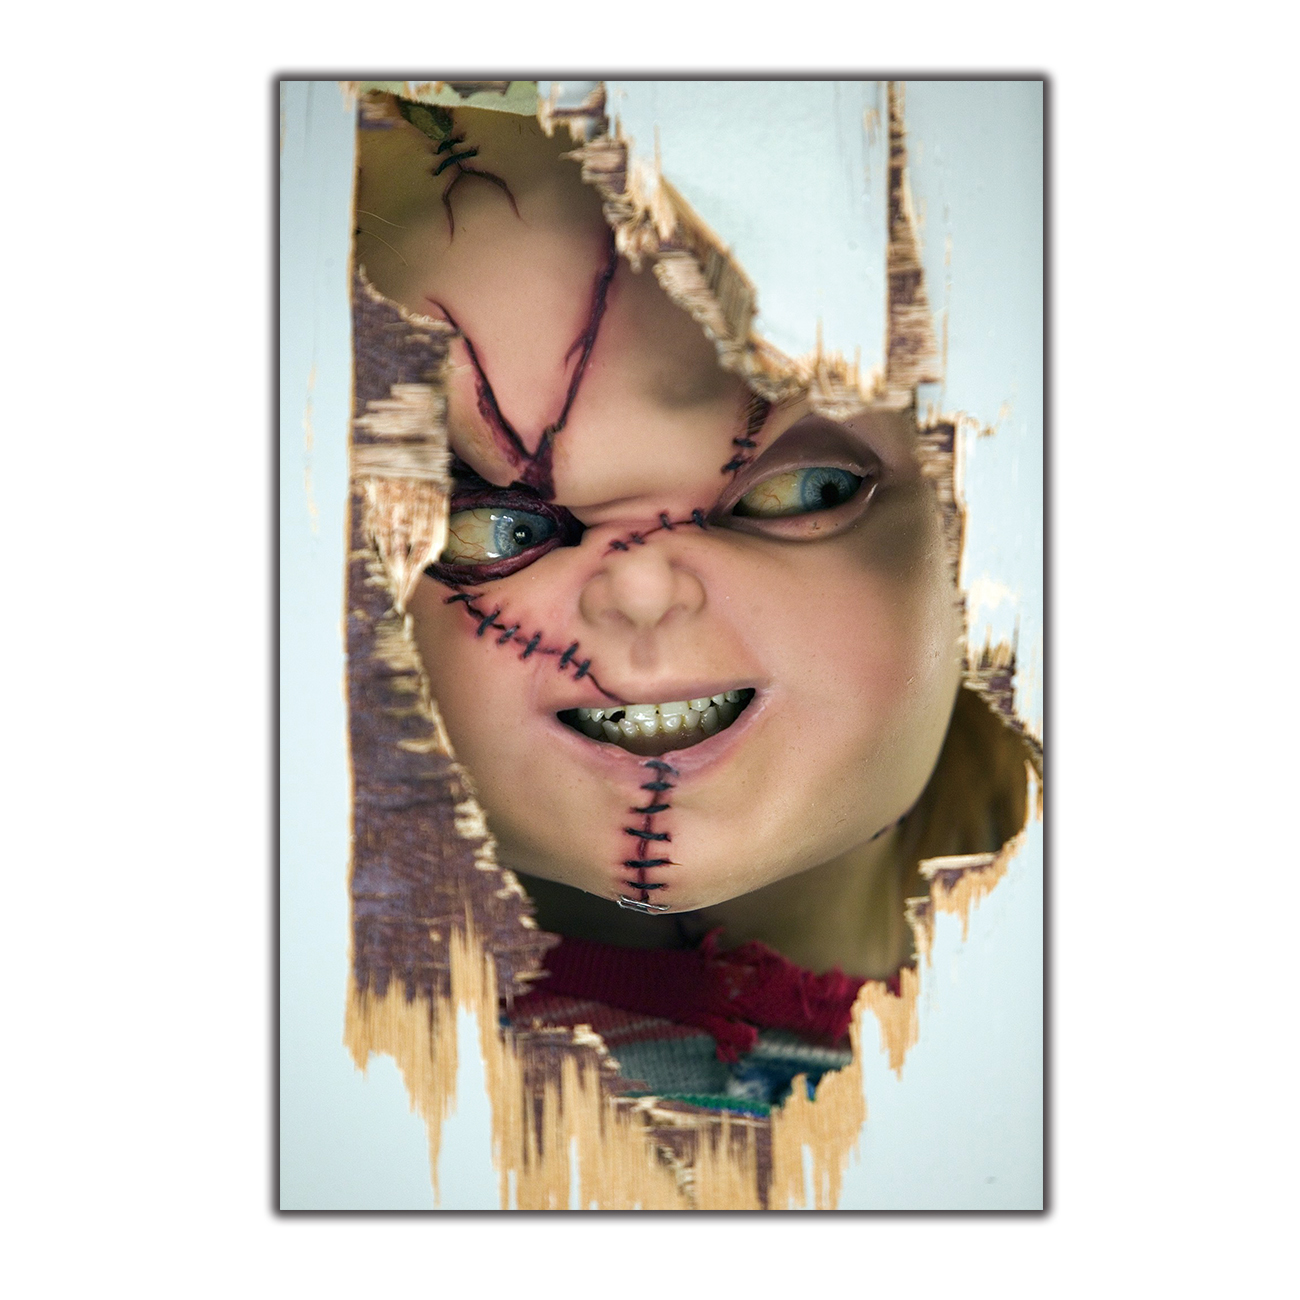 Bride Of Chucky Horror Movie Silk Fabric Poster Canvas Art Print 12x18 24x36inch